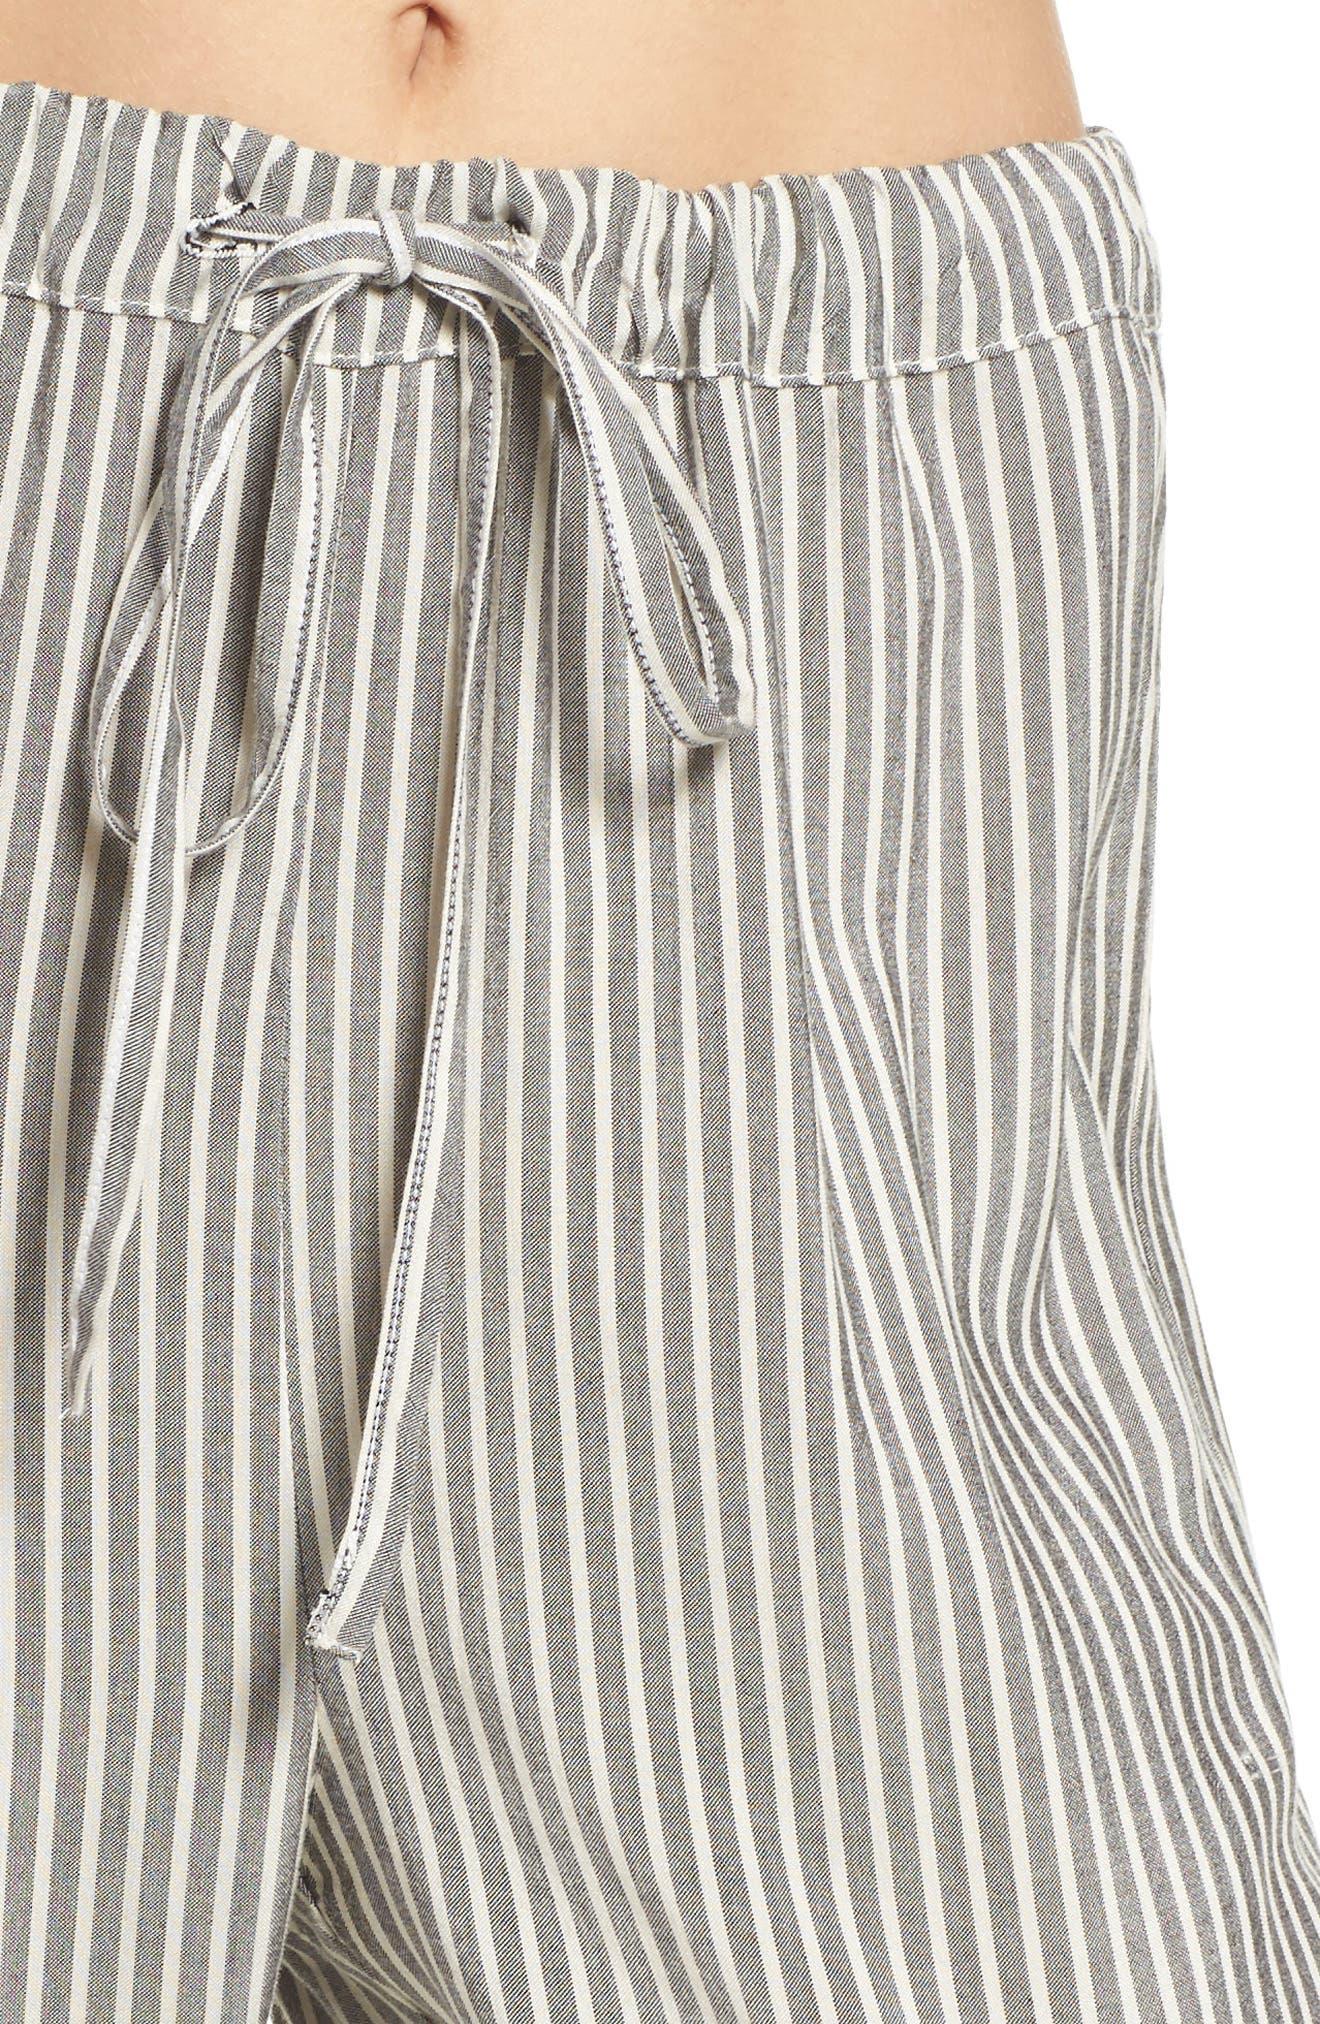 Stripe Pajama Pants,                             Alternate thumbnail 4, color,                             020